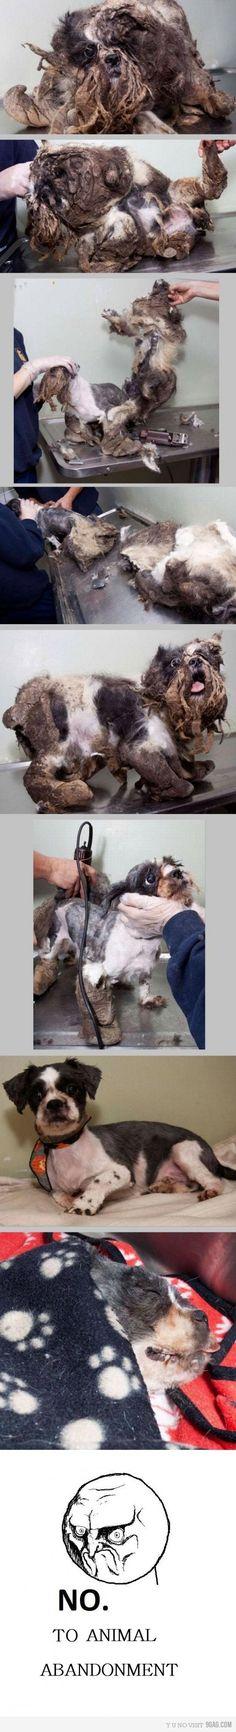 Animal abuse.: Doggie ́S, Animal Rights, Animal Cruelty, Pet, Animal Abuse, First Haircut, Animal Abandonment, Poor Baby, So Sad